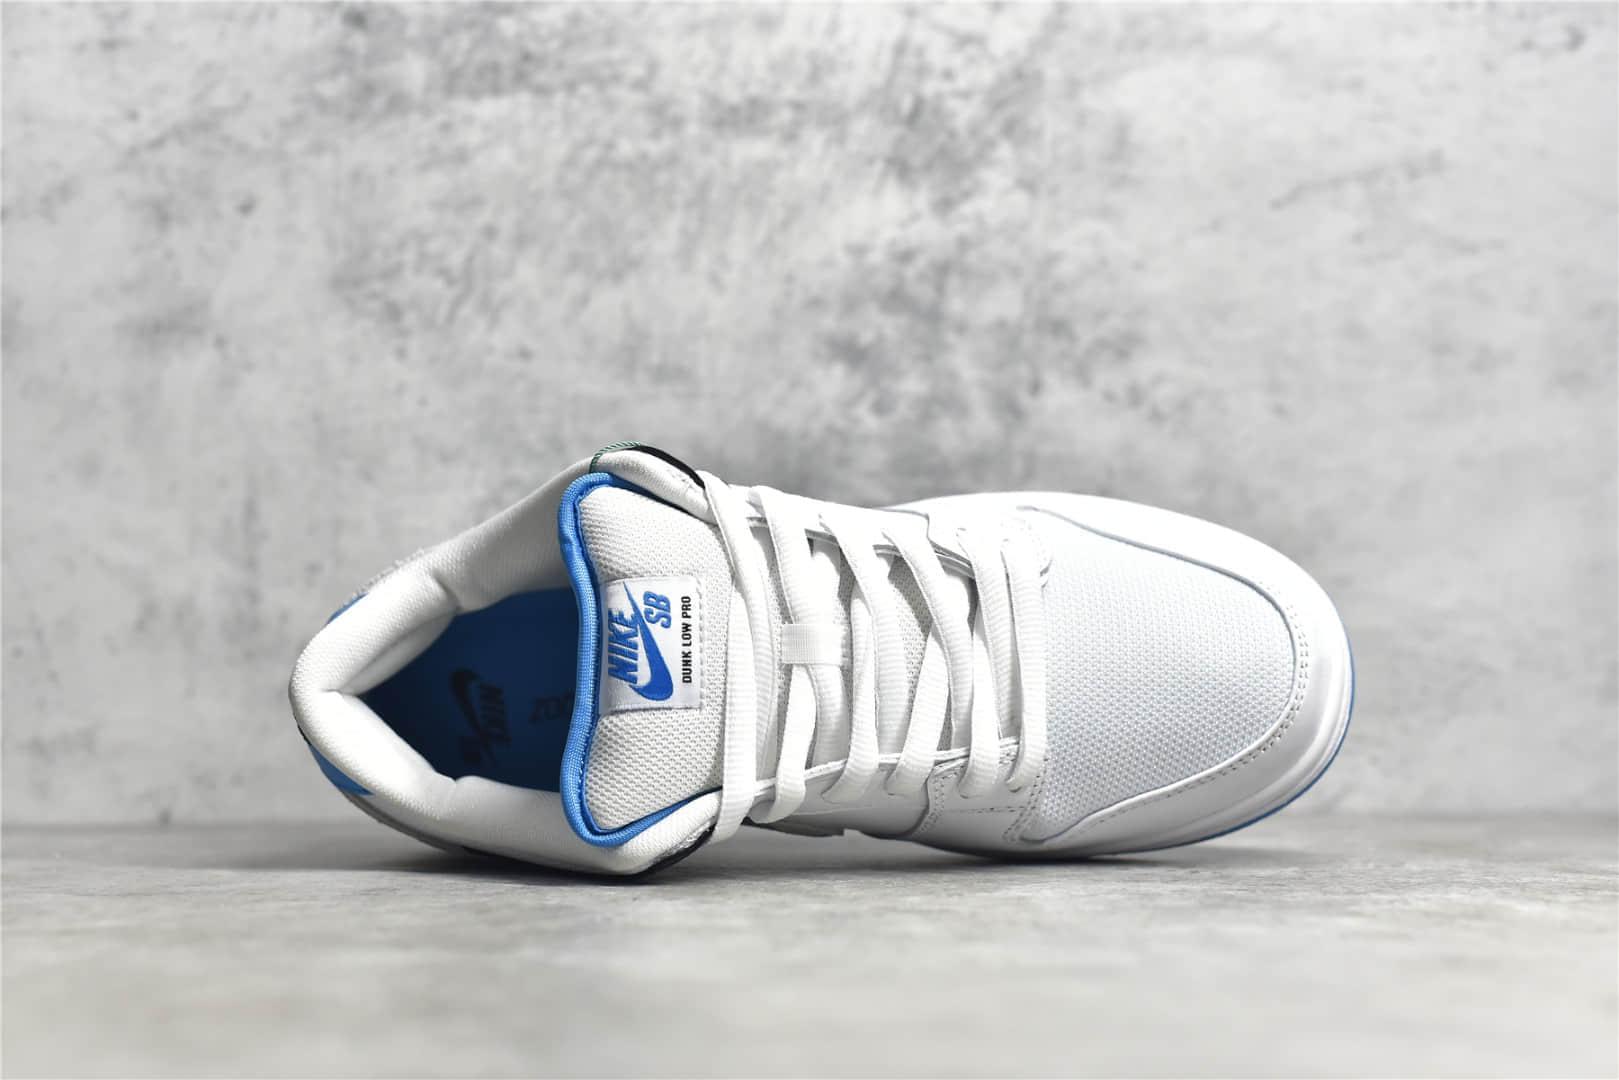 耐克Dunk SB白黑蓝低帮 Nike SB Dunk Low